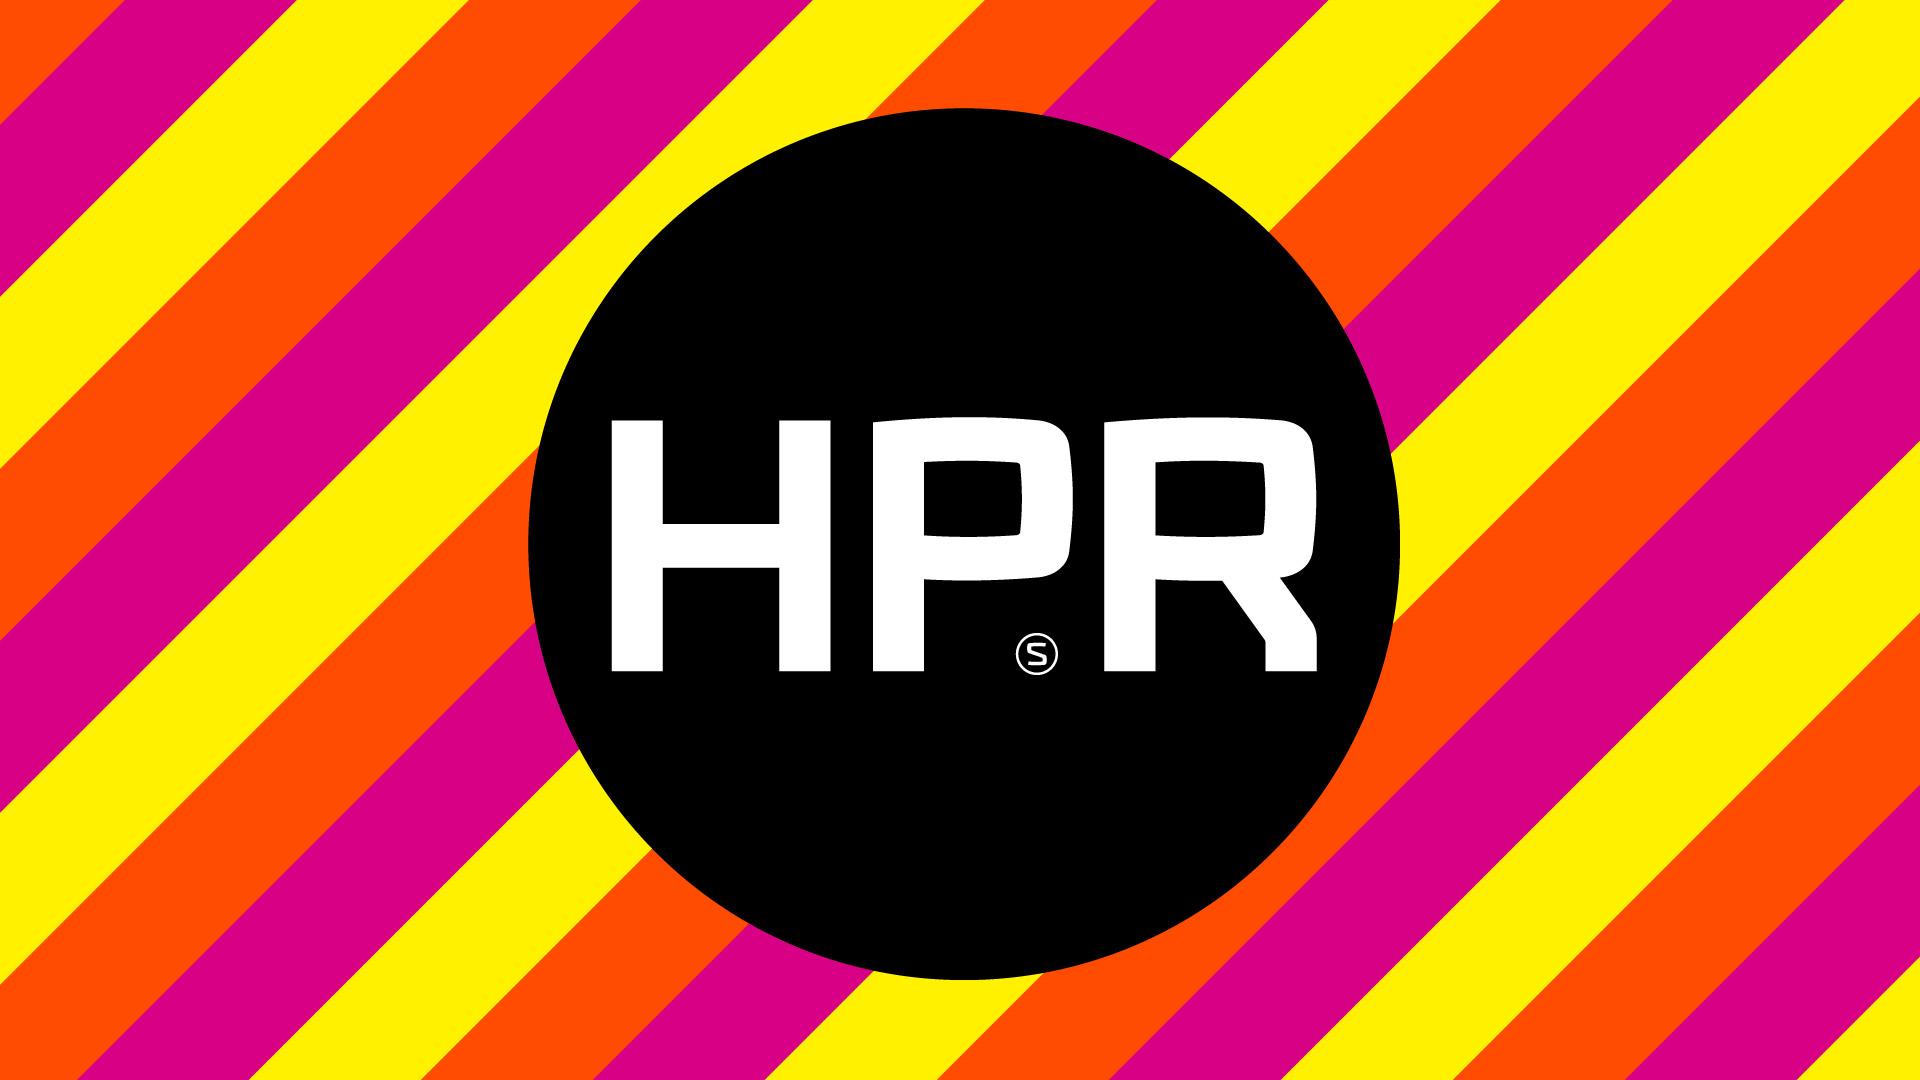 ASGARD branding, дизайн логотипа, HPR, Hyper, beermix, Хайпер